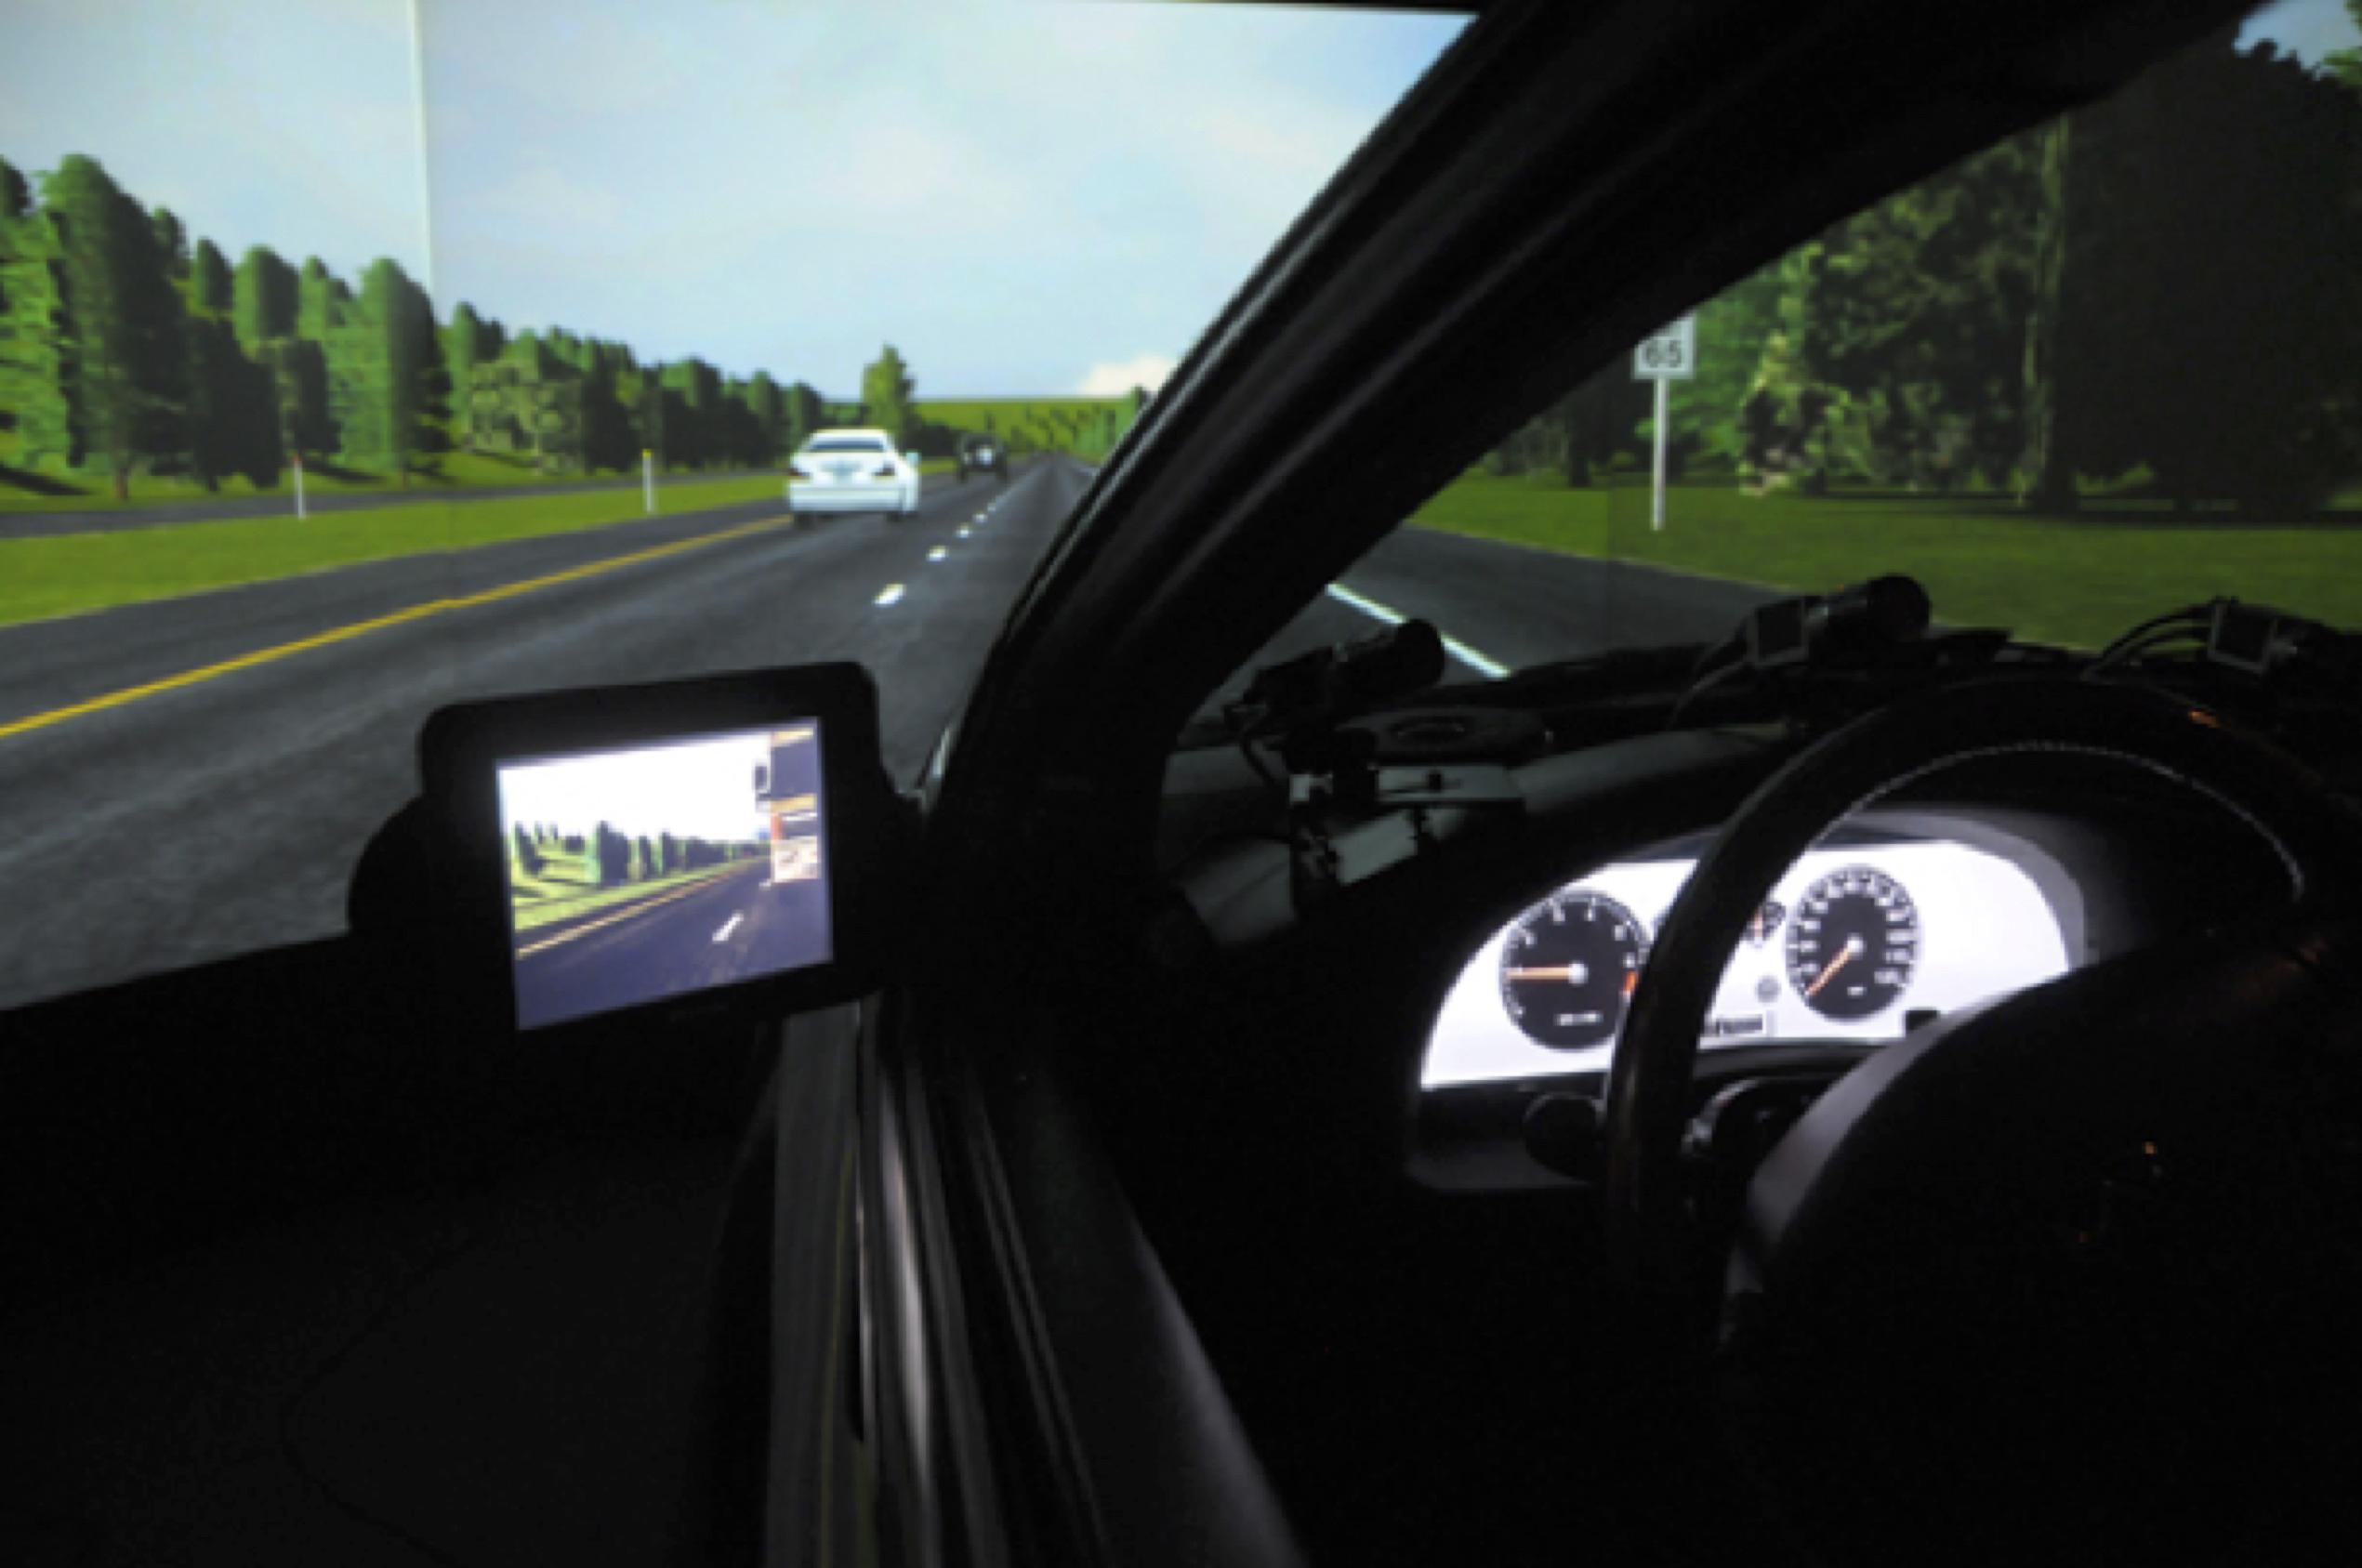 Risk Evaluation for In-Vehicle Sign Information